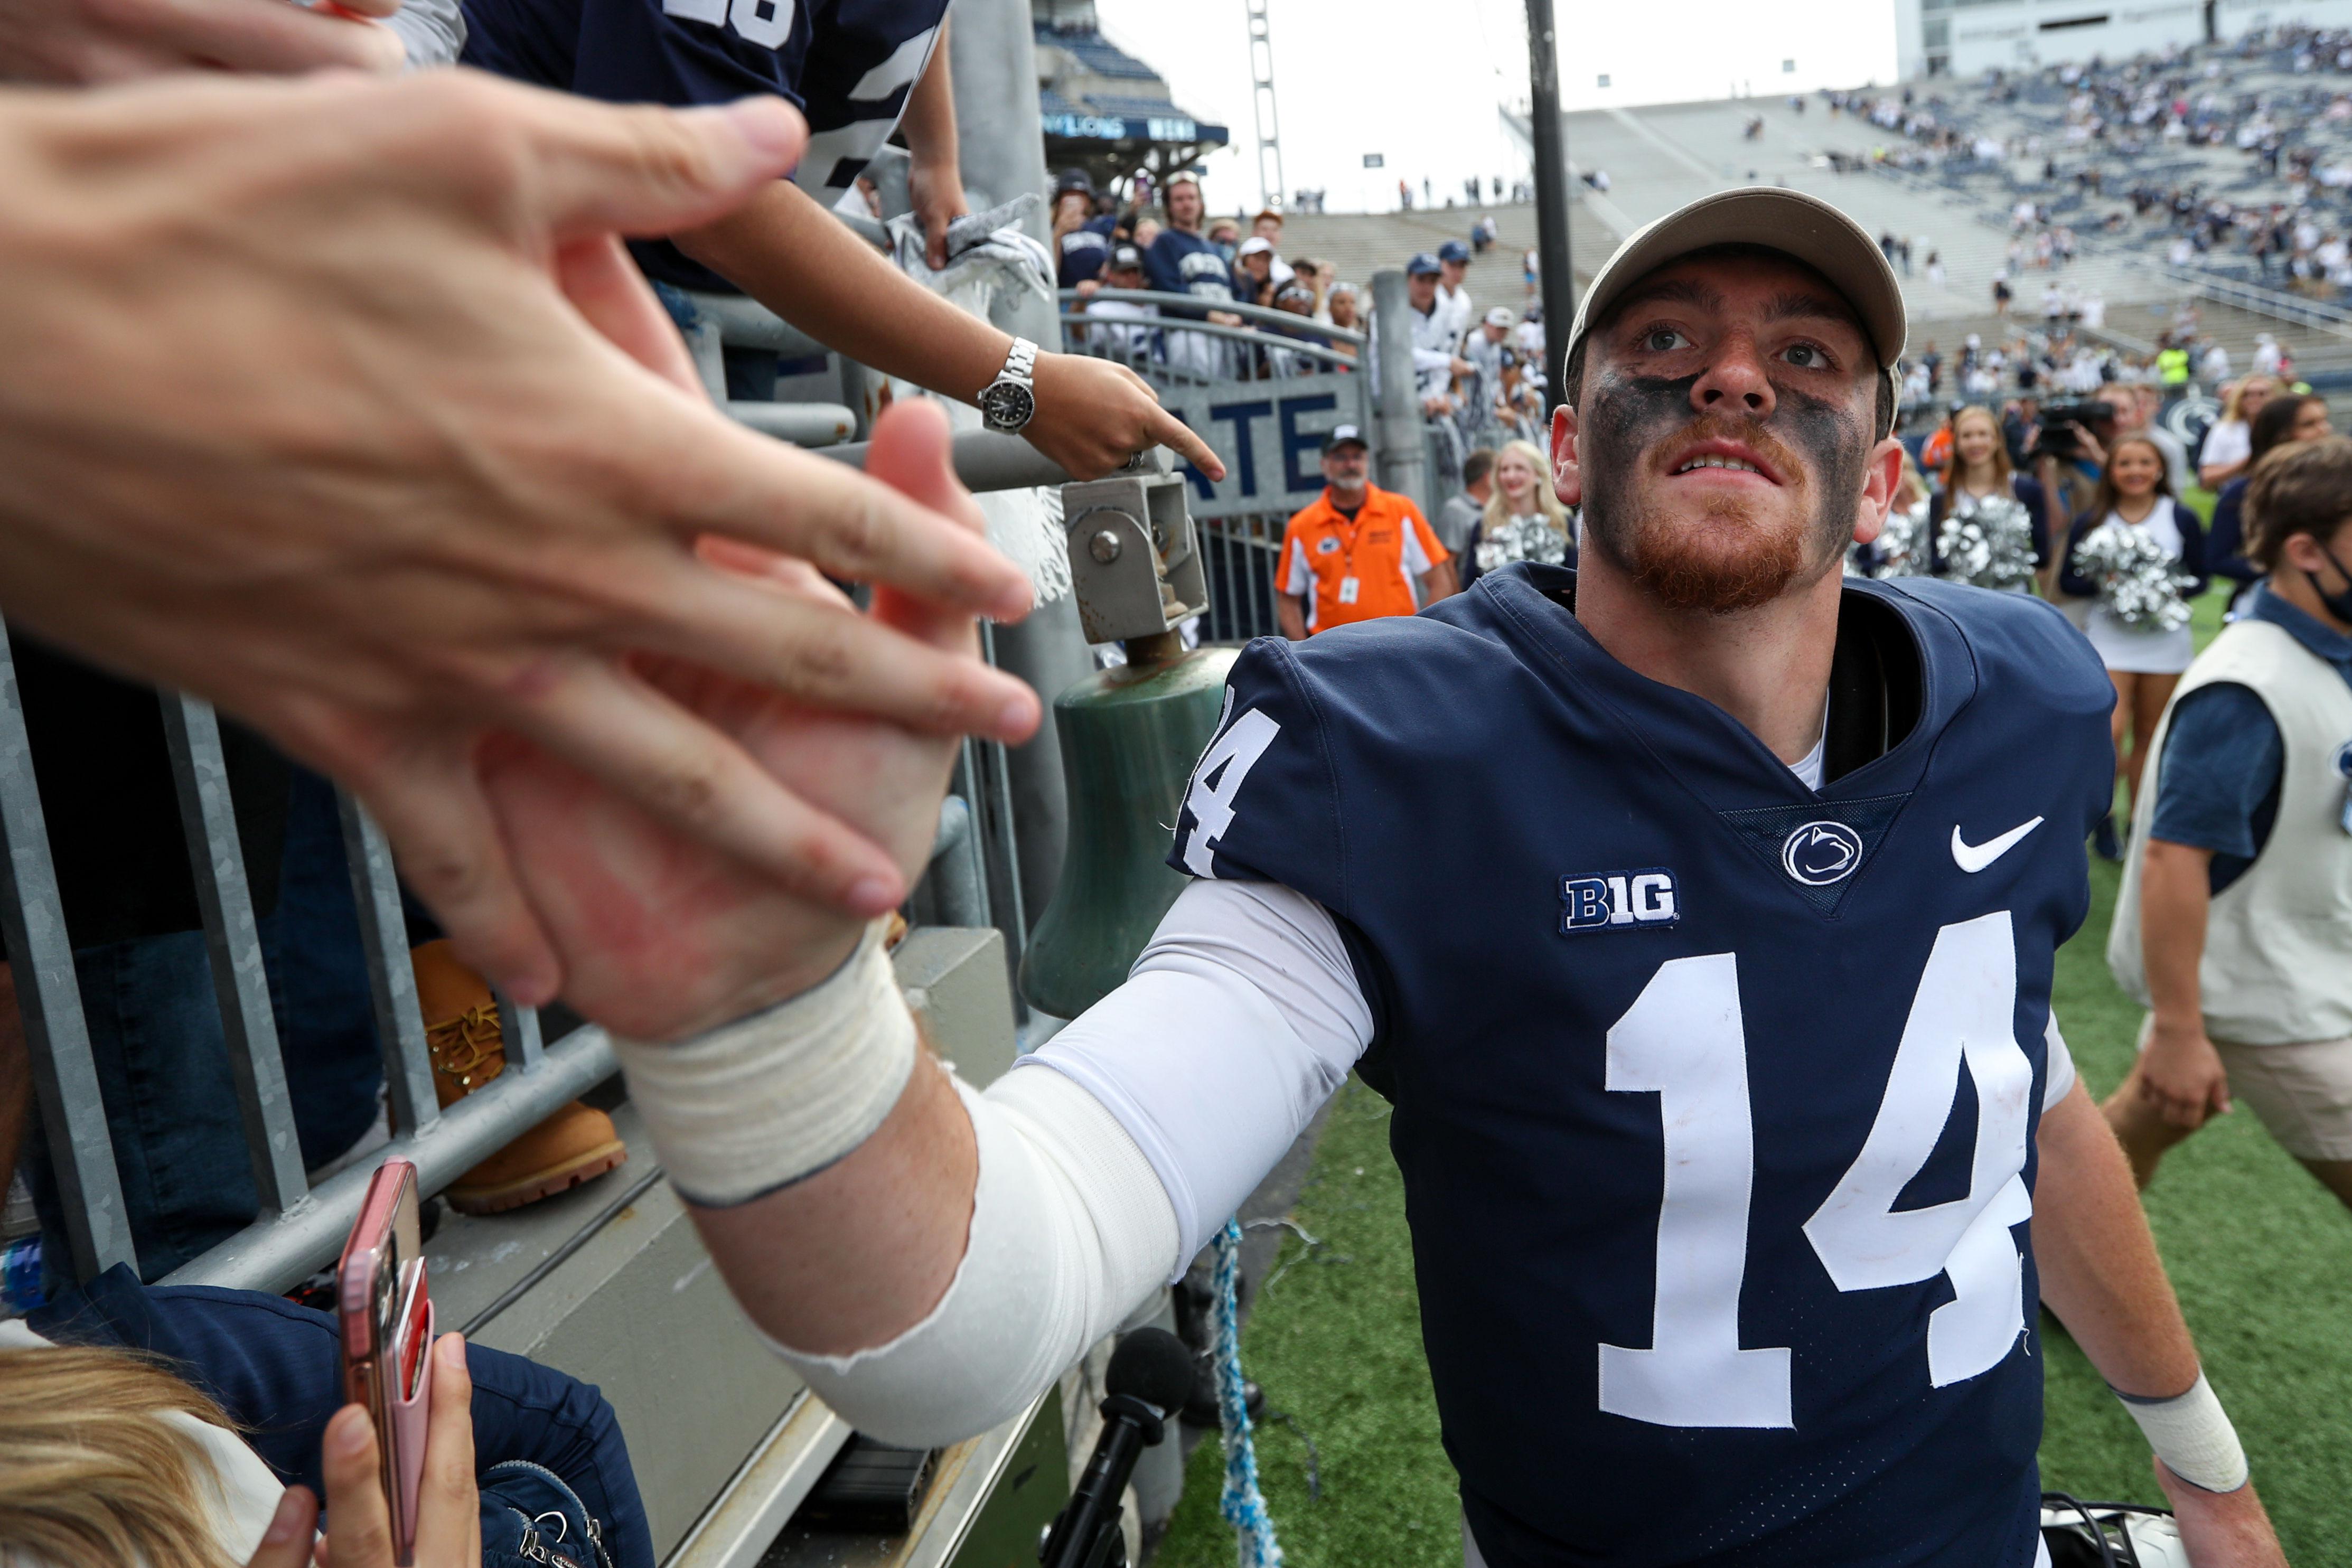 Penn State Quarterback Sean Clifford greeting fans after the game against Villanova.